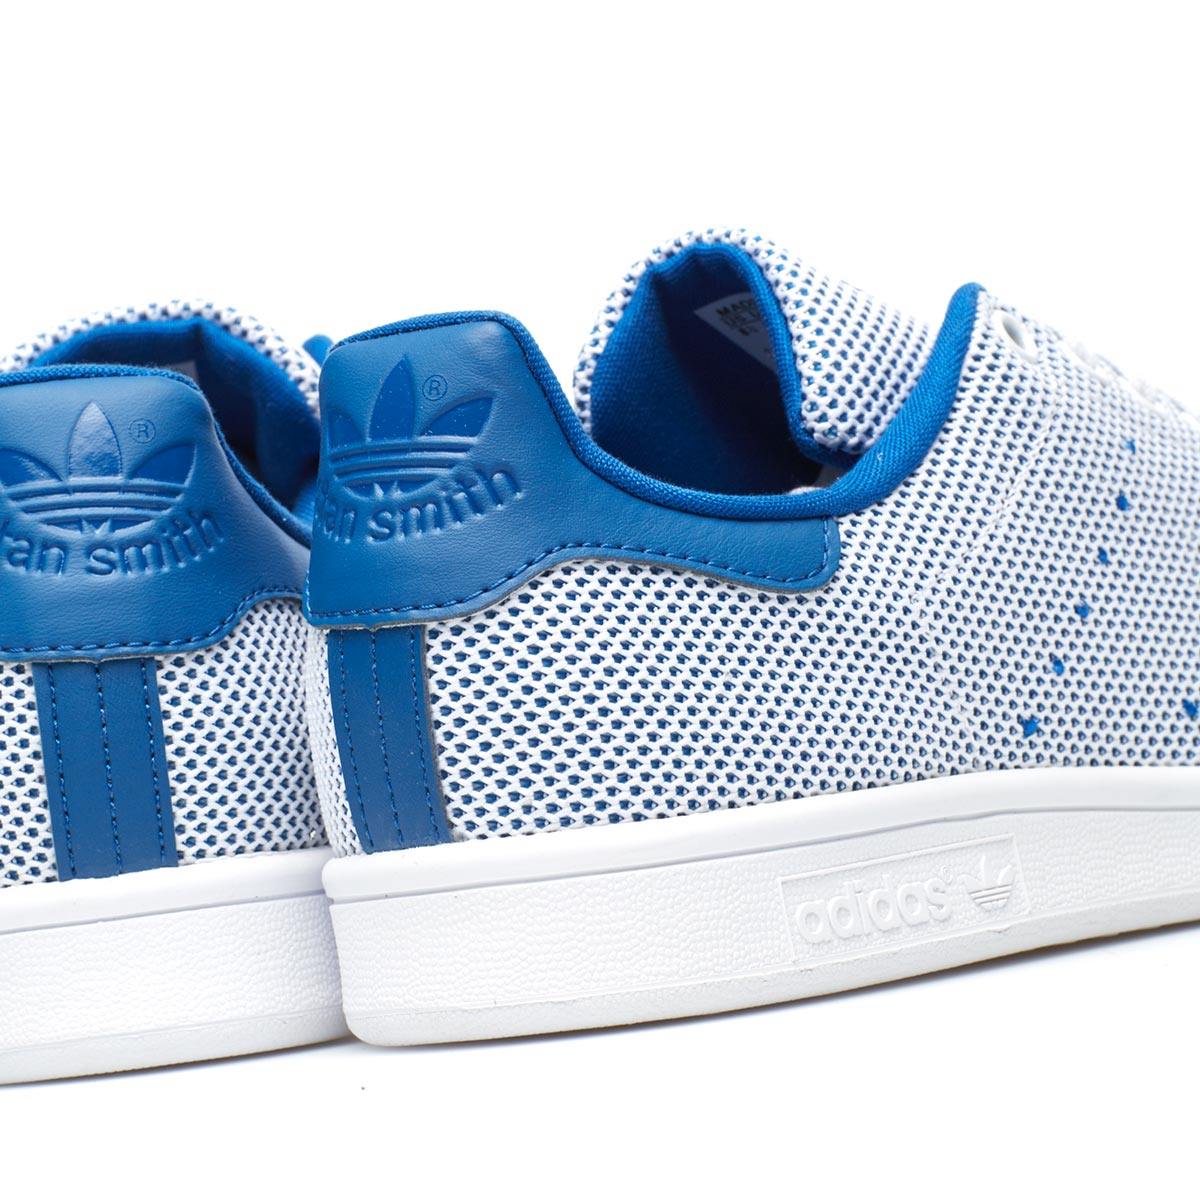 adicolor stan smith lyst adidas originals für männer in blau